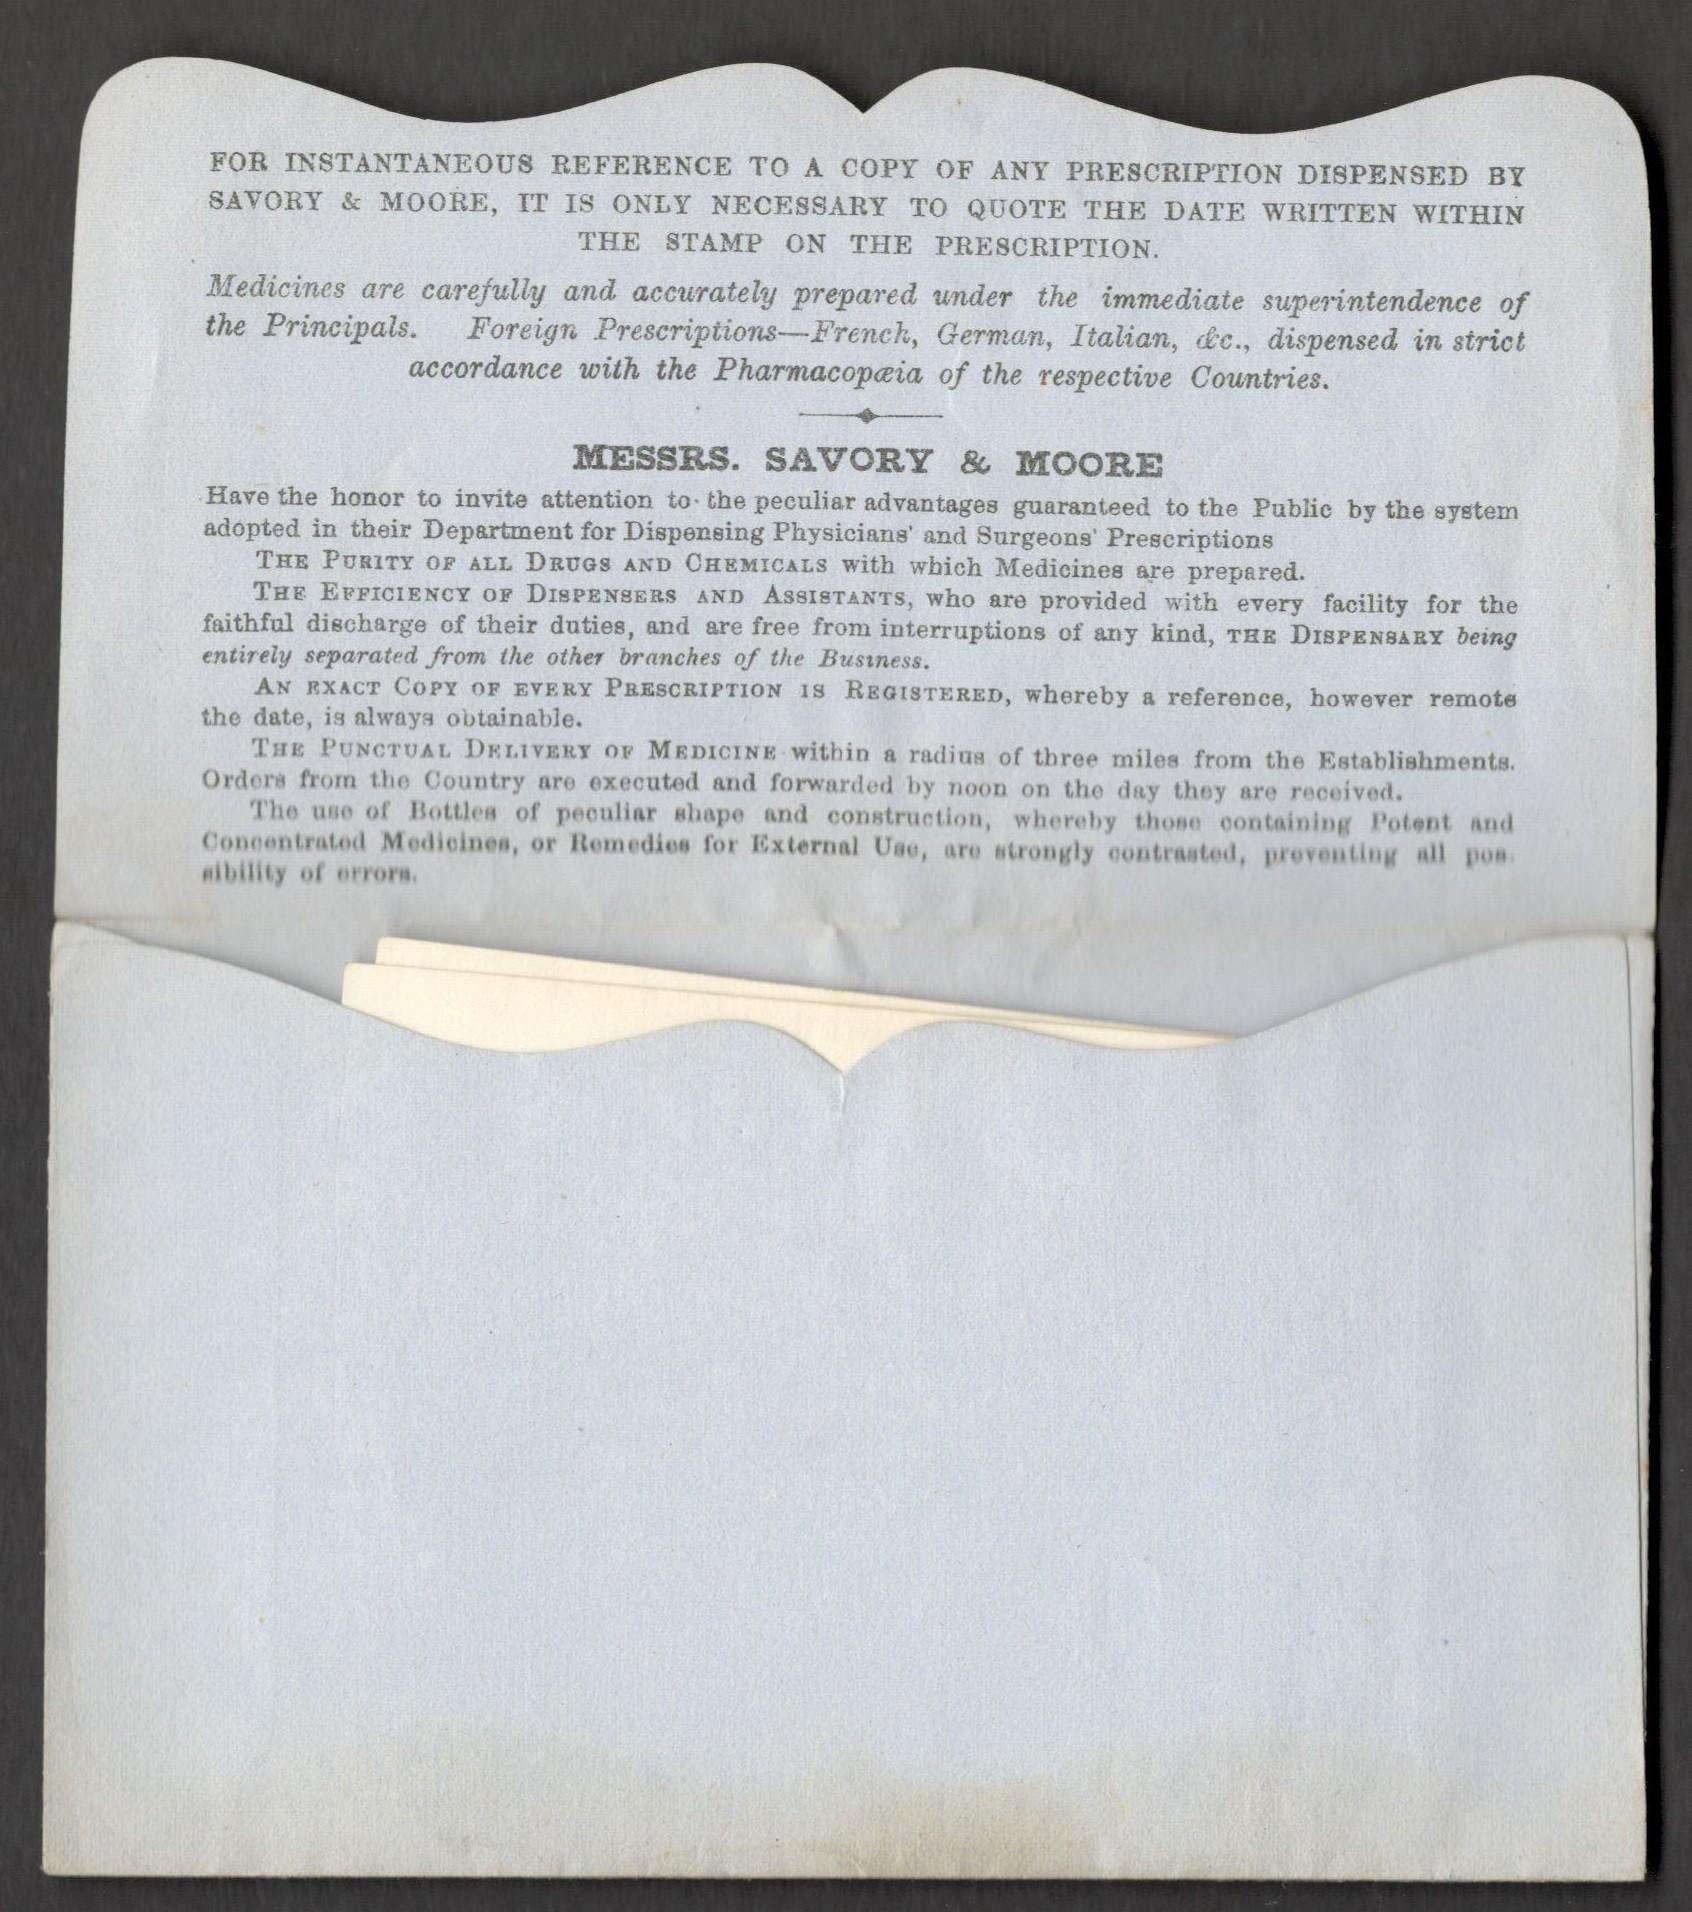 Lot 18 - PHARMACY PRESCRIPTION ENVELOPES (3)